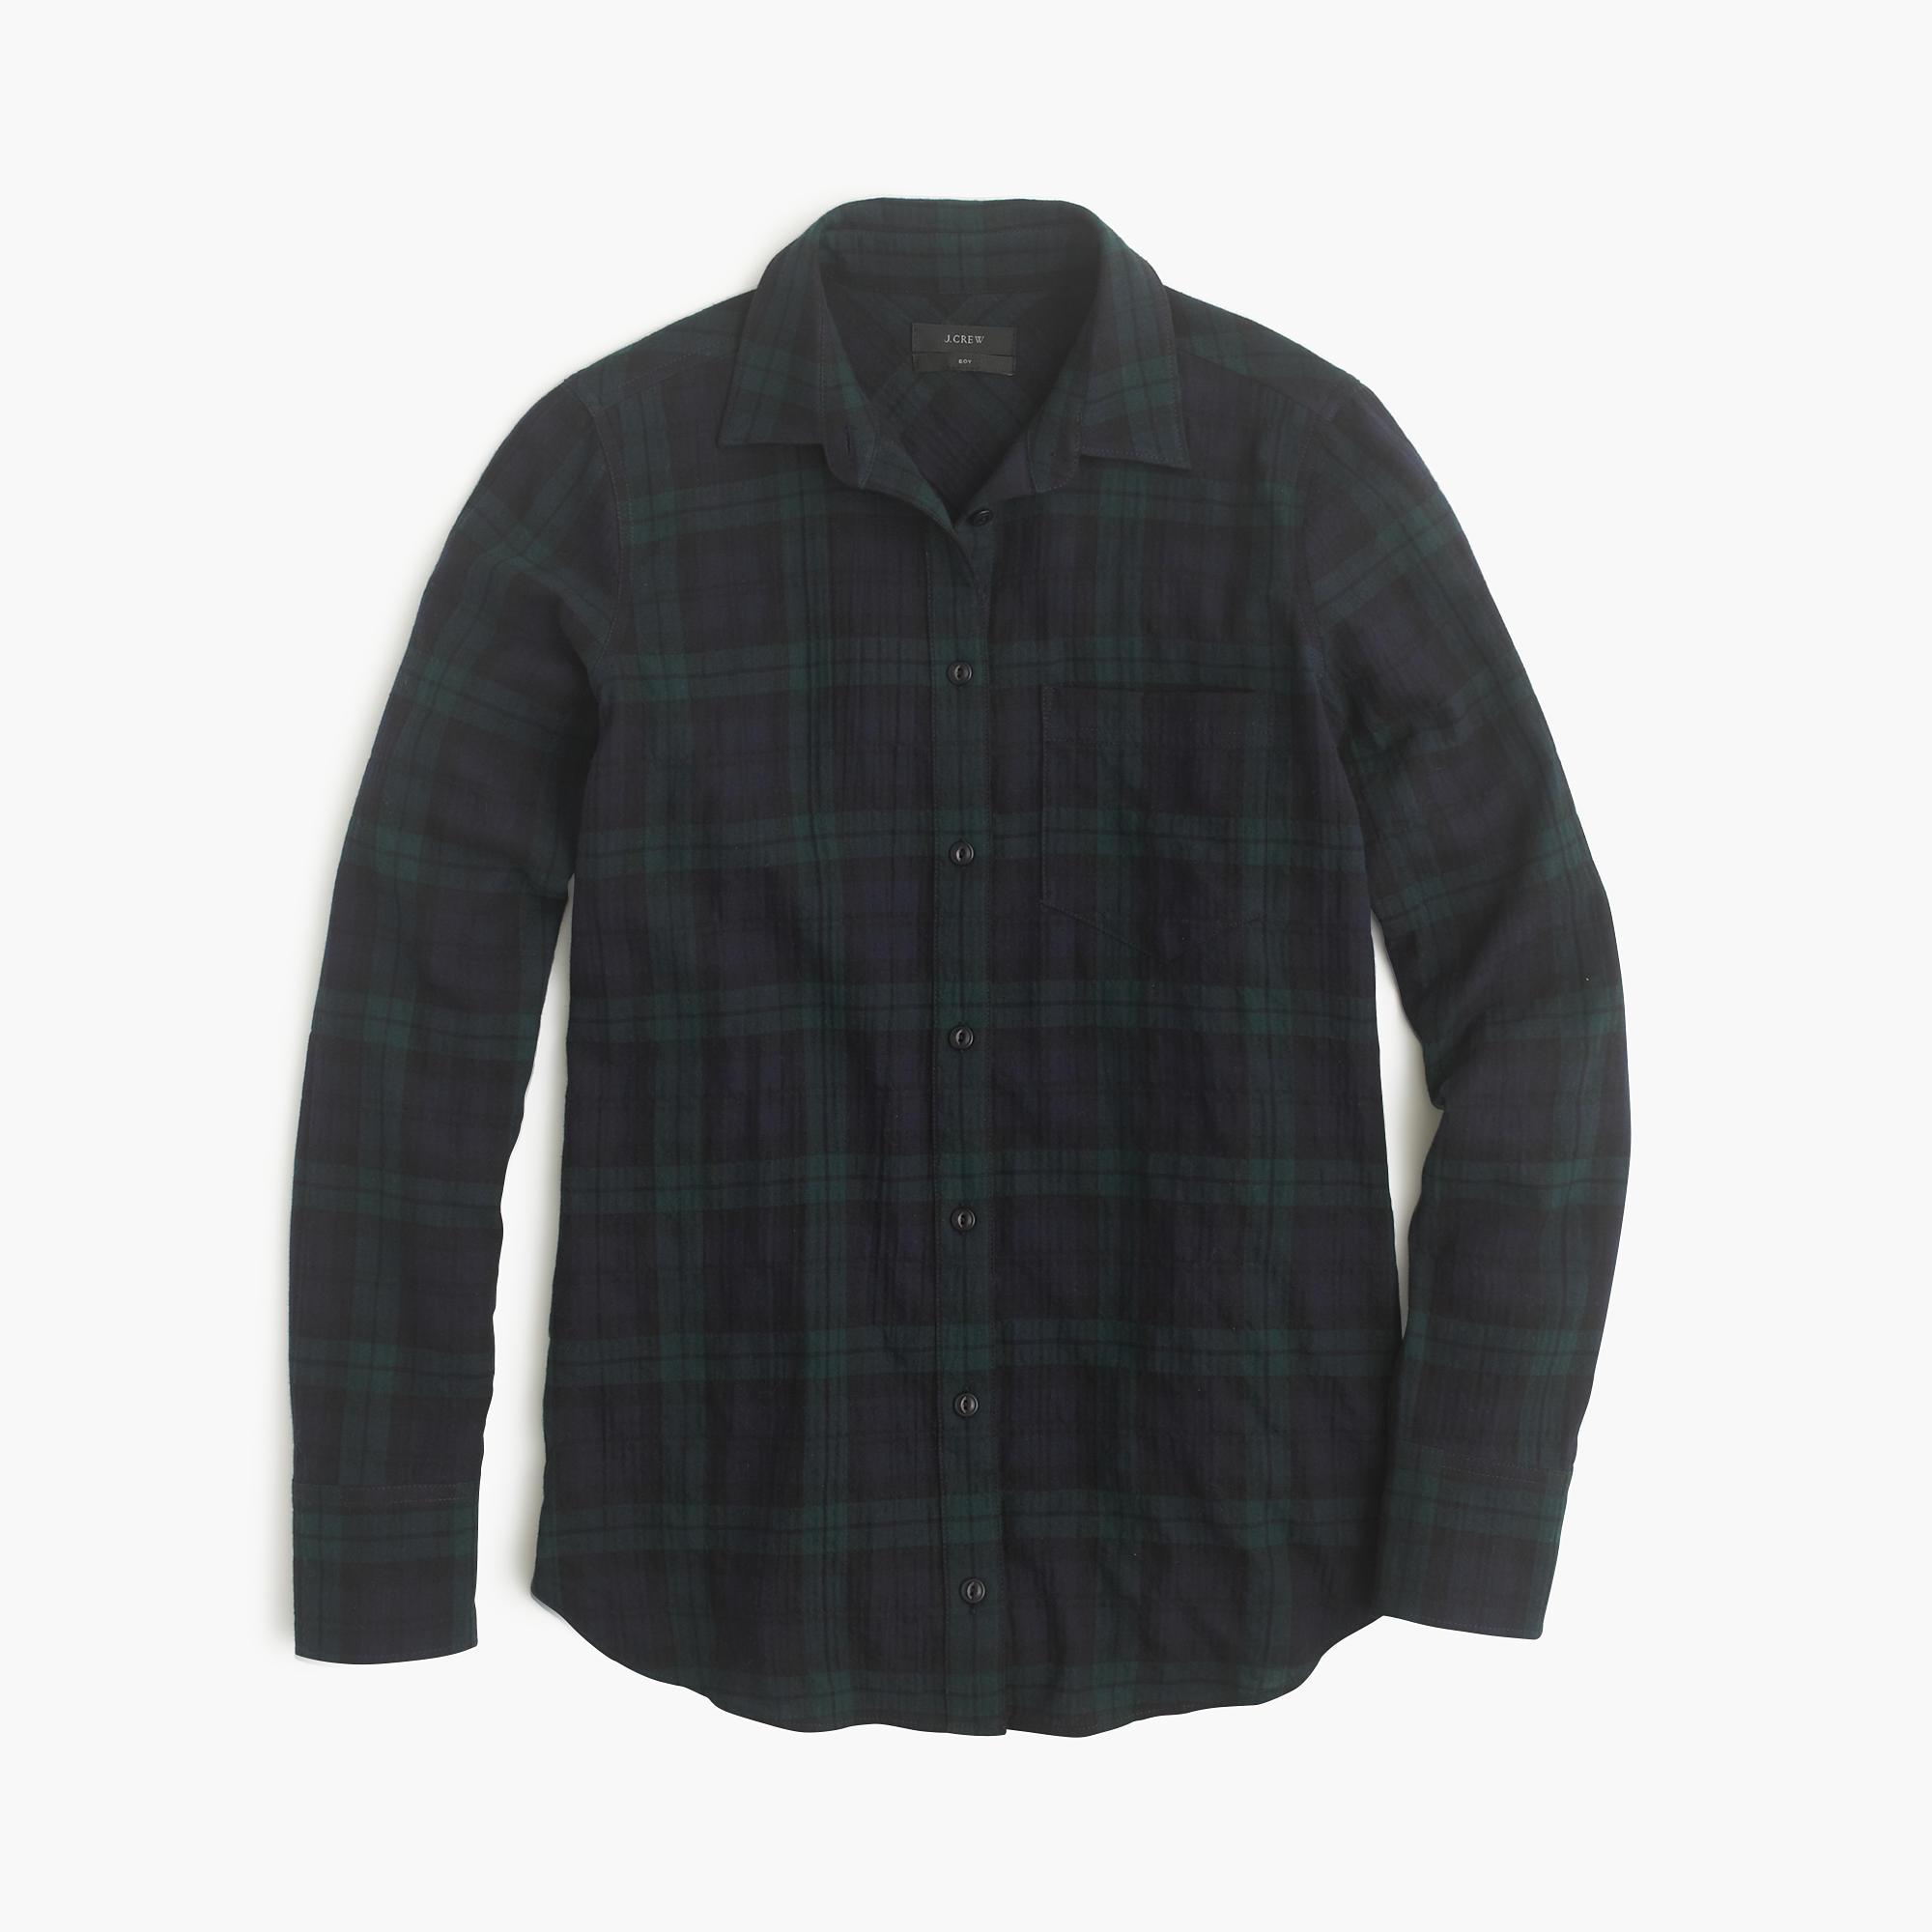 Boy shirt in black watch flannel j crew for Black watch plaid flannel shirt